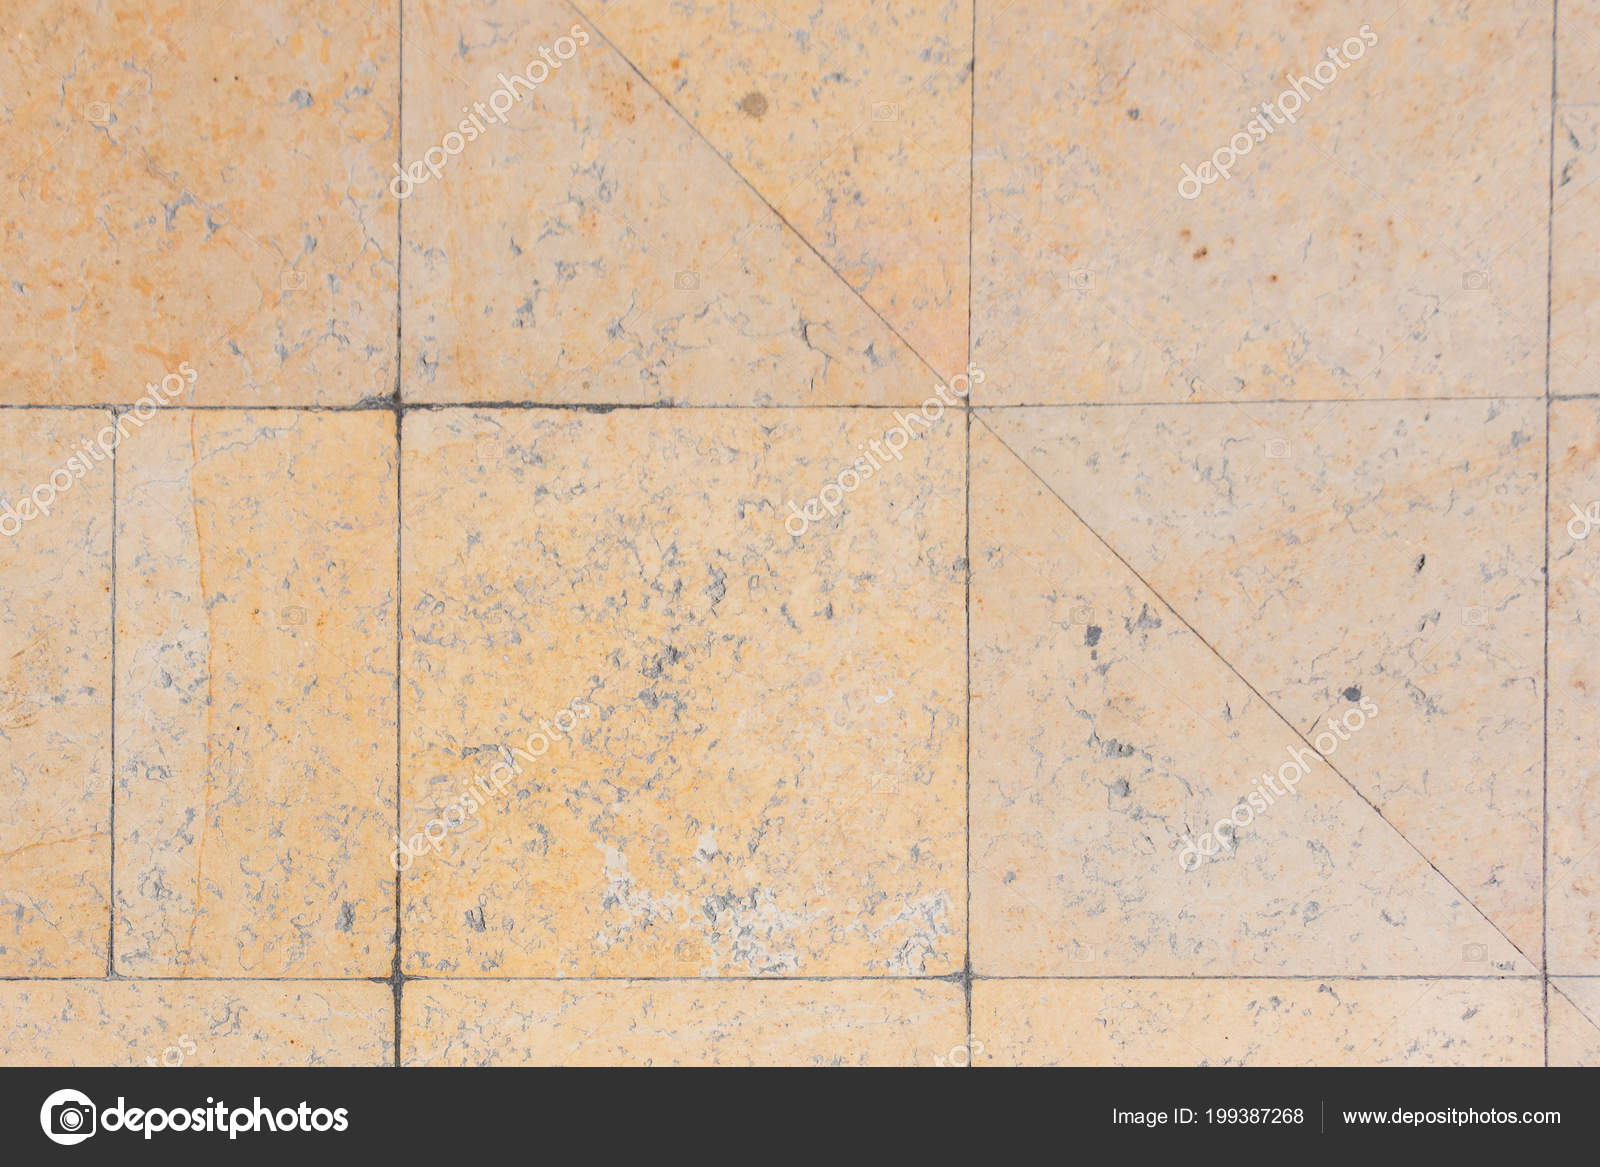 Old Marble Floor Tiles Texture Stock Photo C Aleksandrbazinlt Gmail Com 199387268